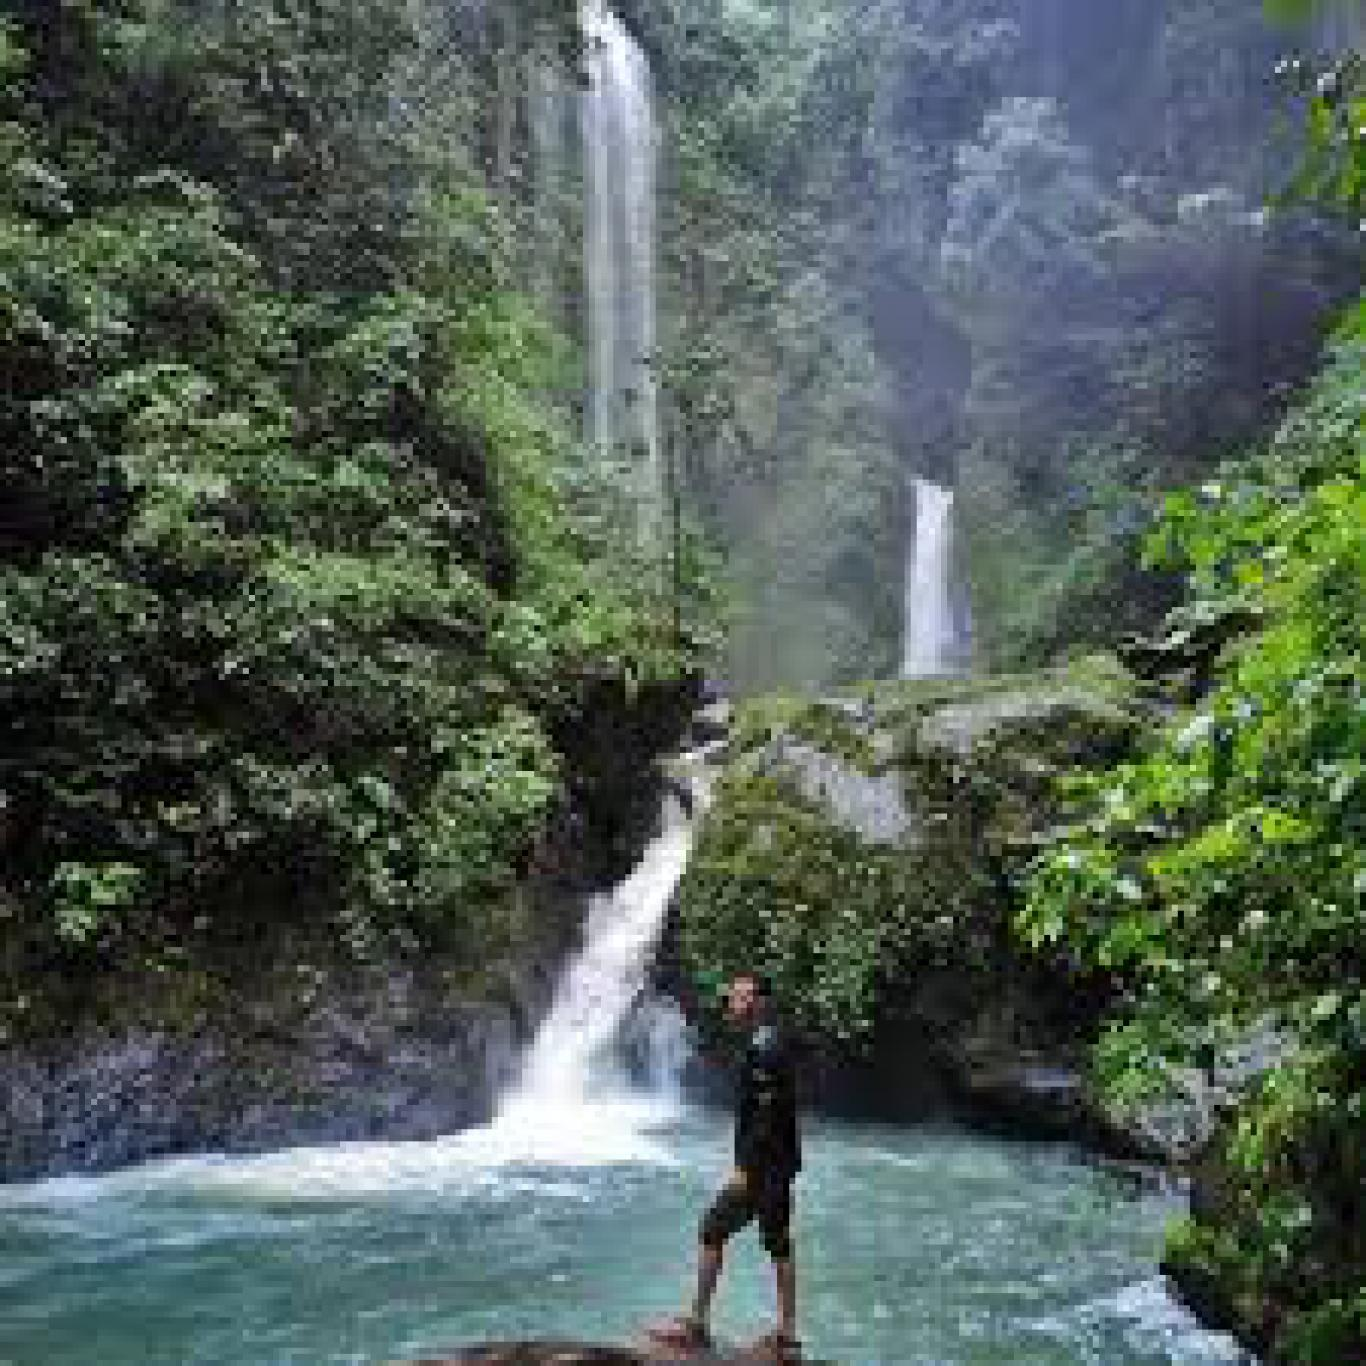 Website Gumantar Tiyu Ngumbak Acara Adat Wisata Desa Kab Lombok